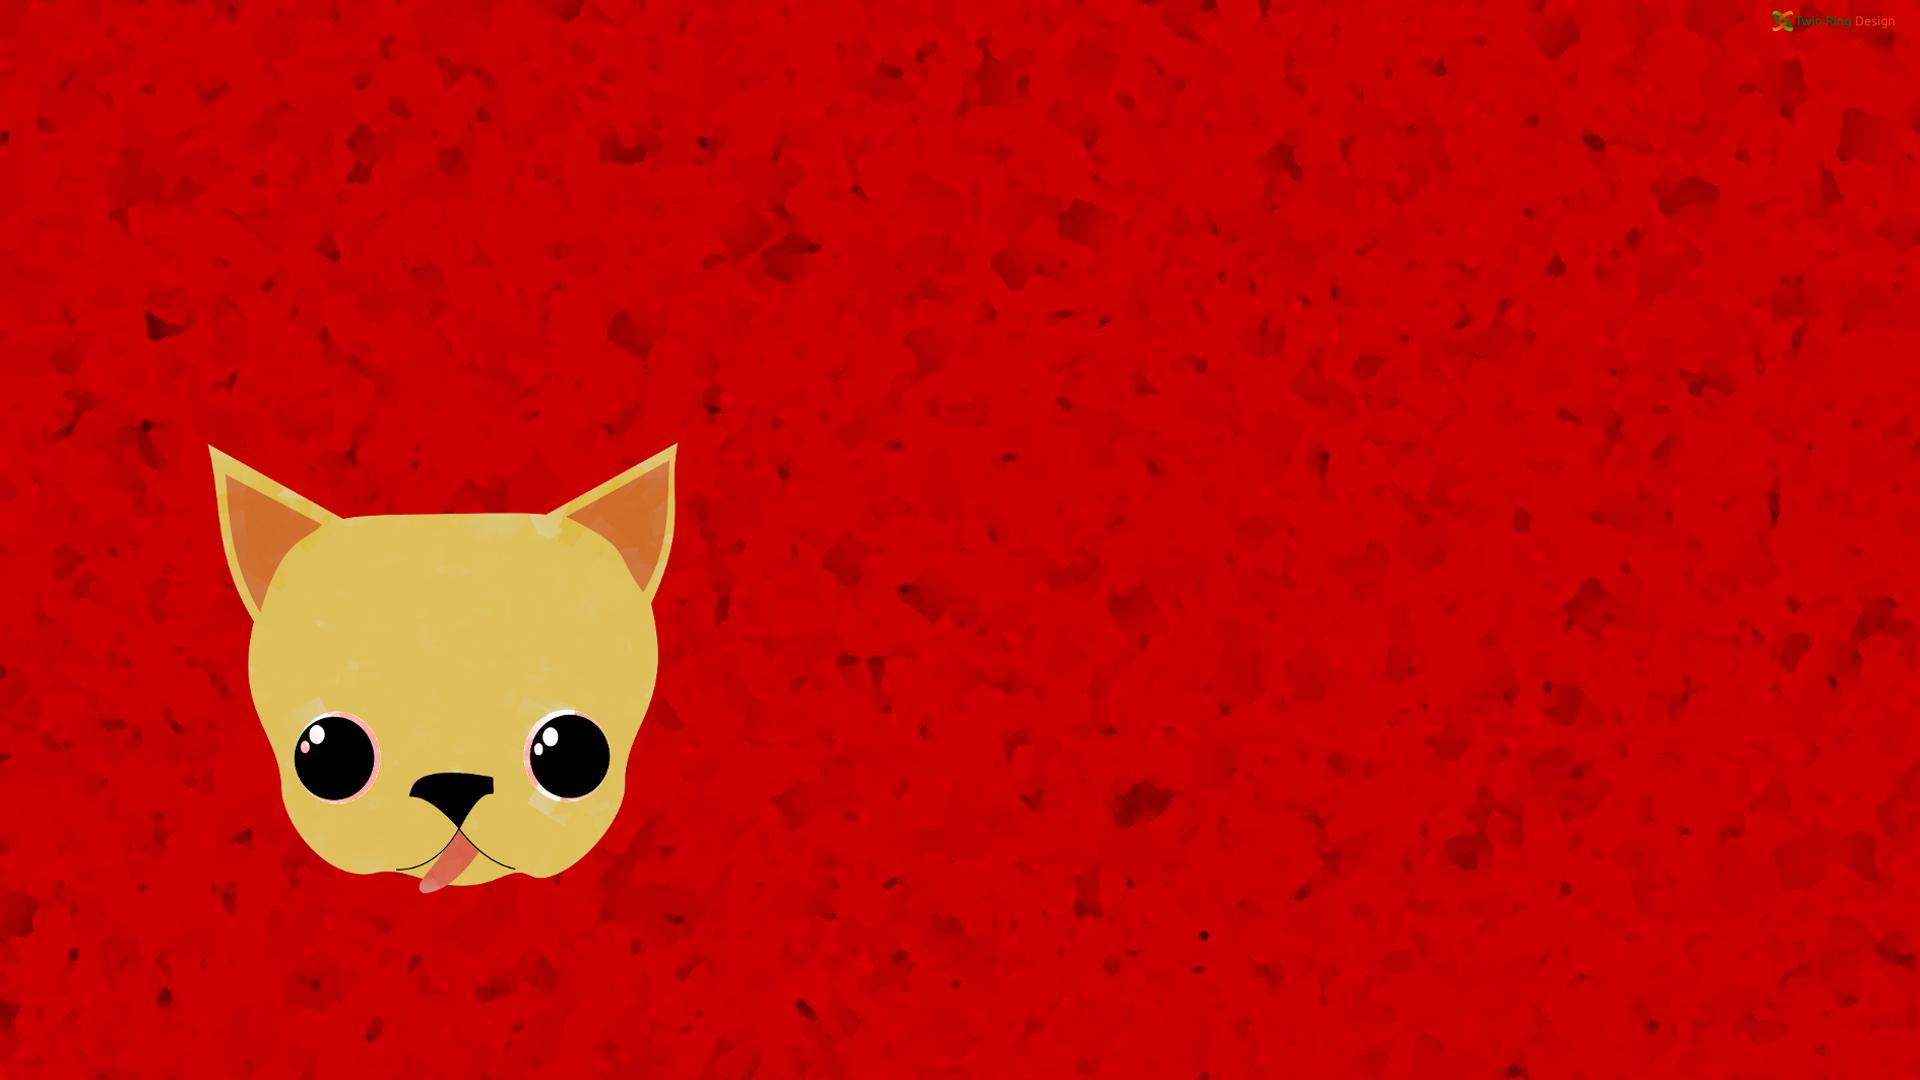 Fondos De Pantalla : Ilustración, Gato, Rojo, Dibujos